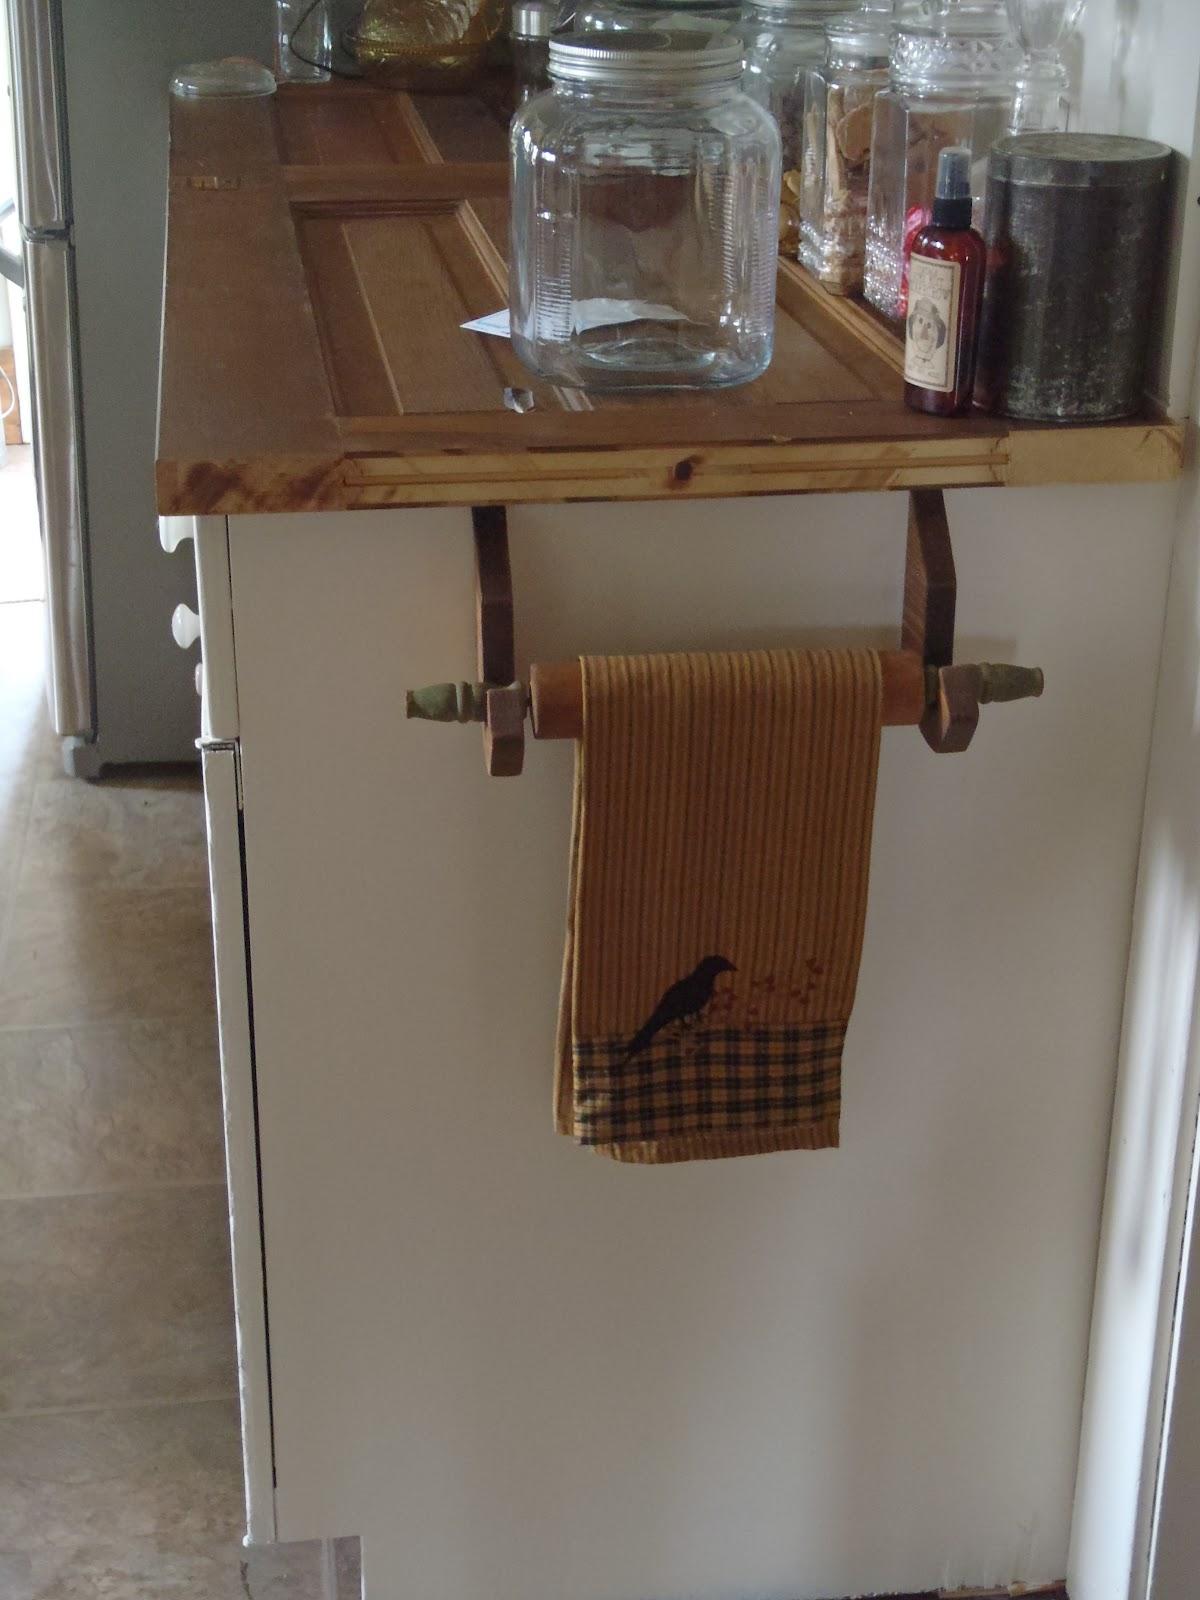 Kitchen Towel Bar Over Cabinet